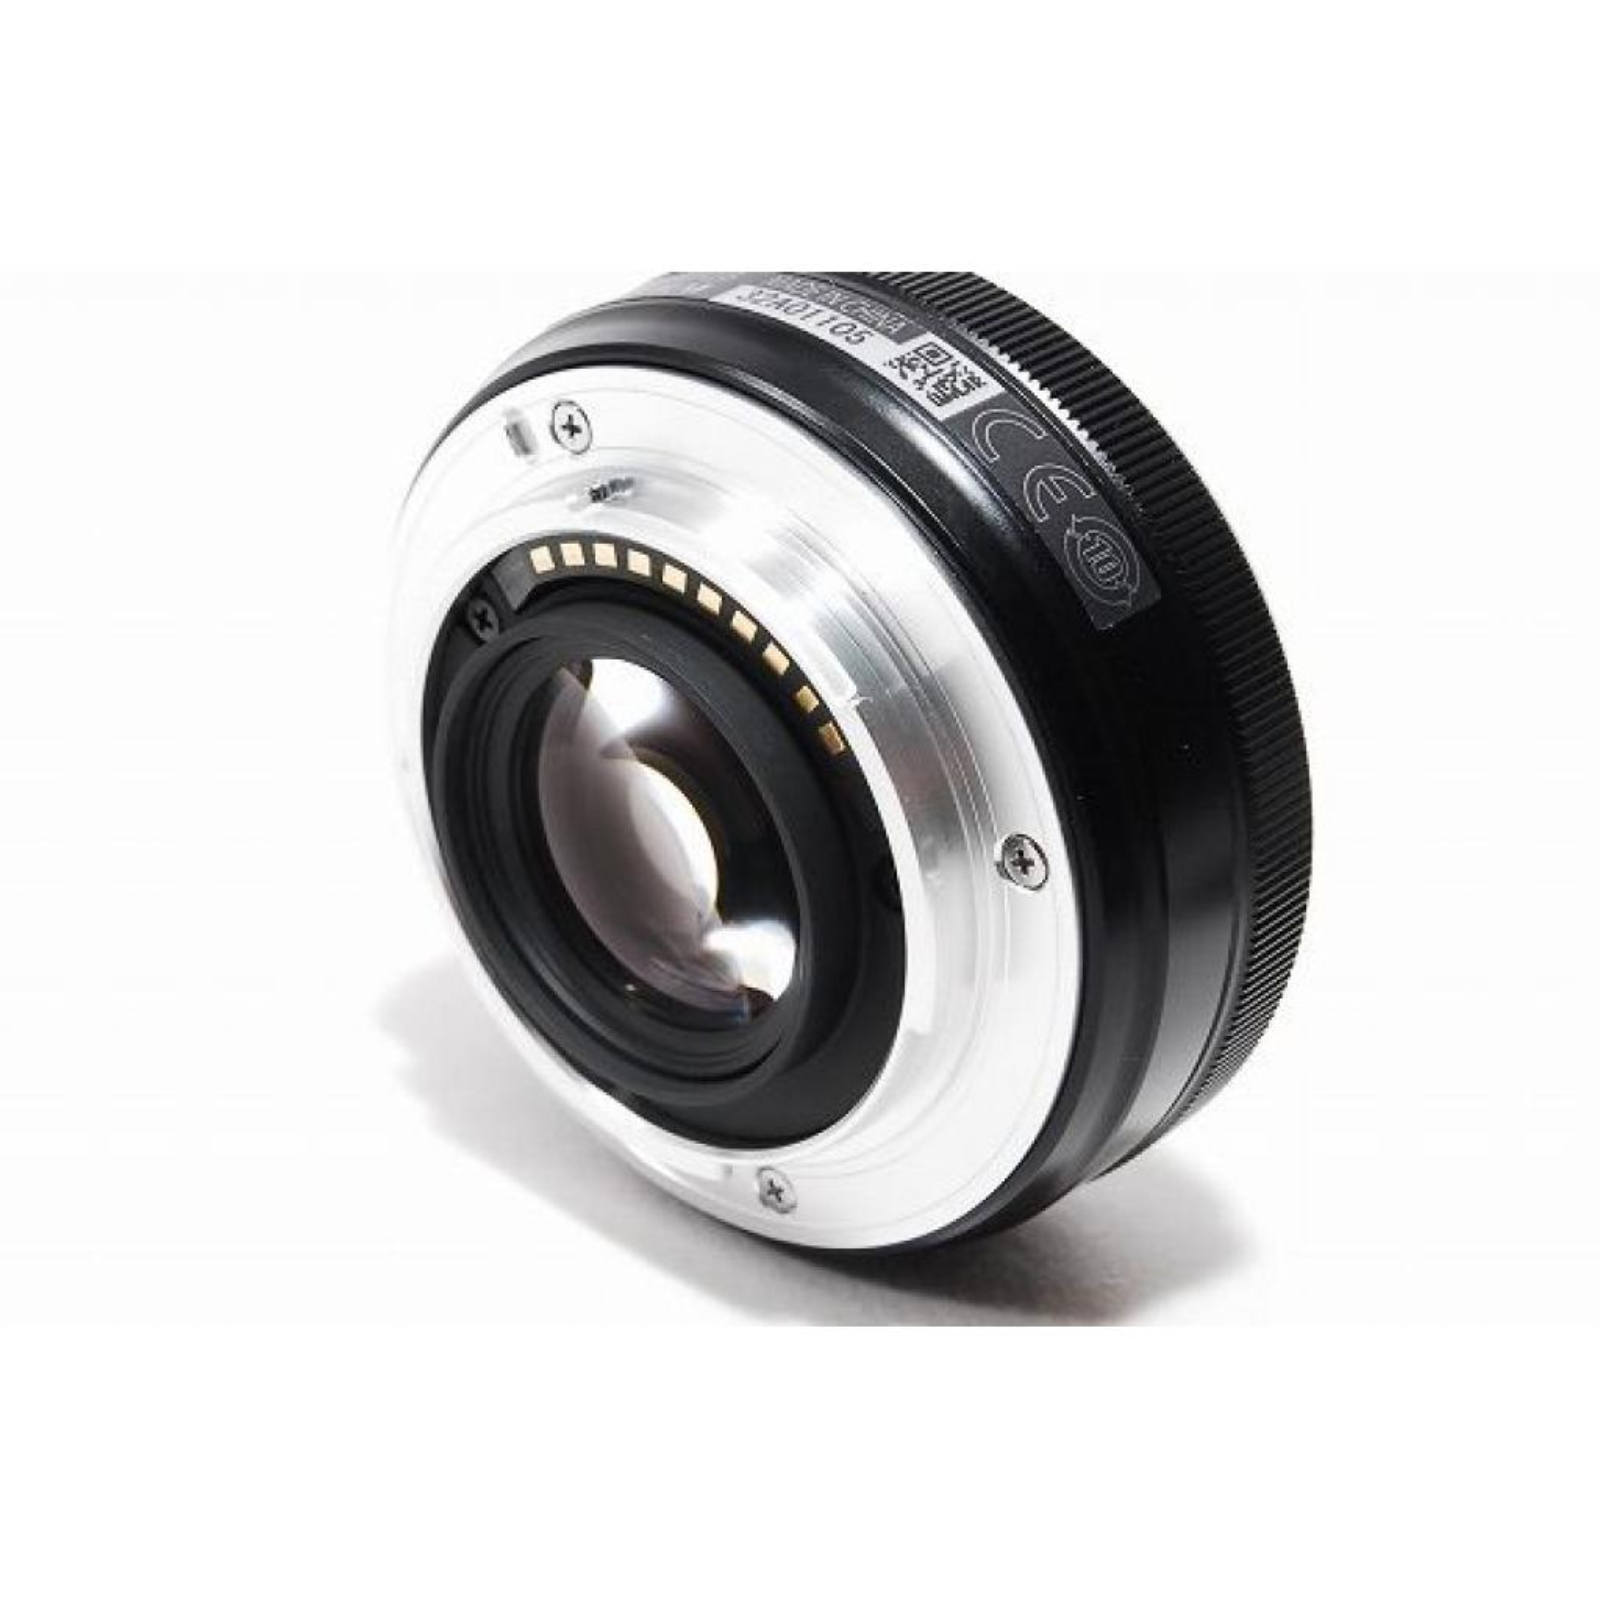 Объектив Fujifilm XF-27mm F2.8 (16389123) изображение 2